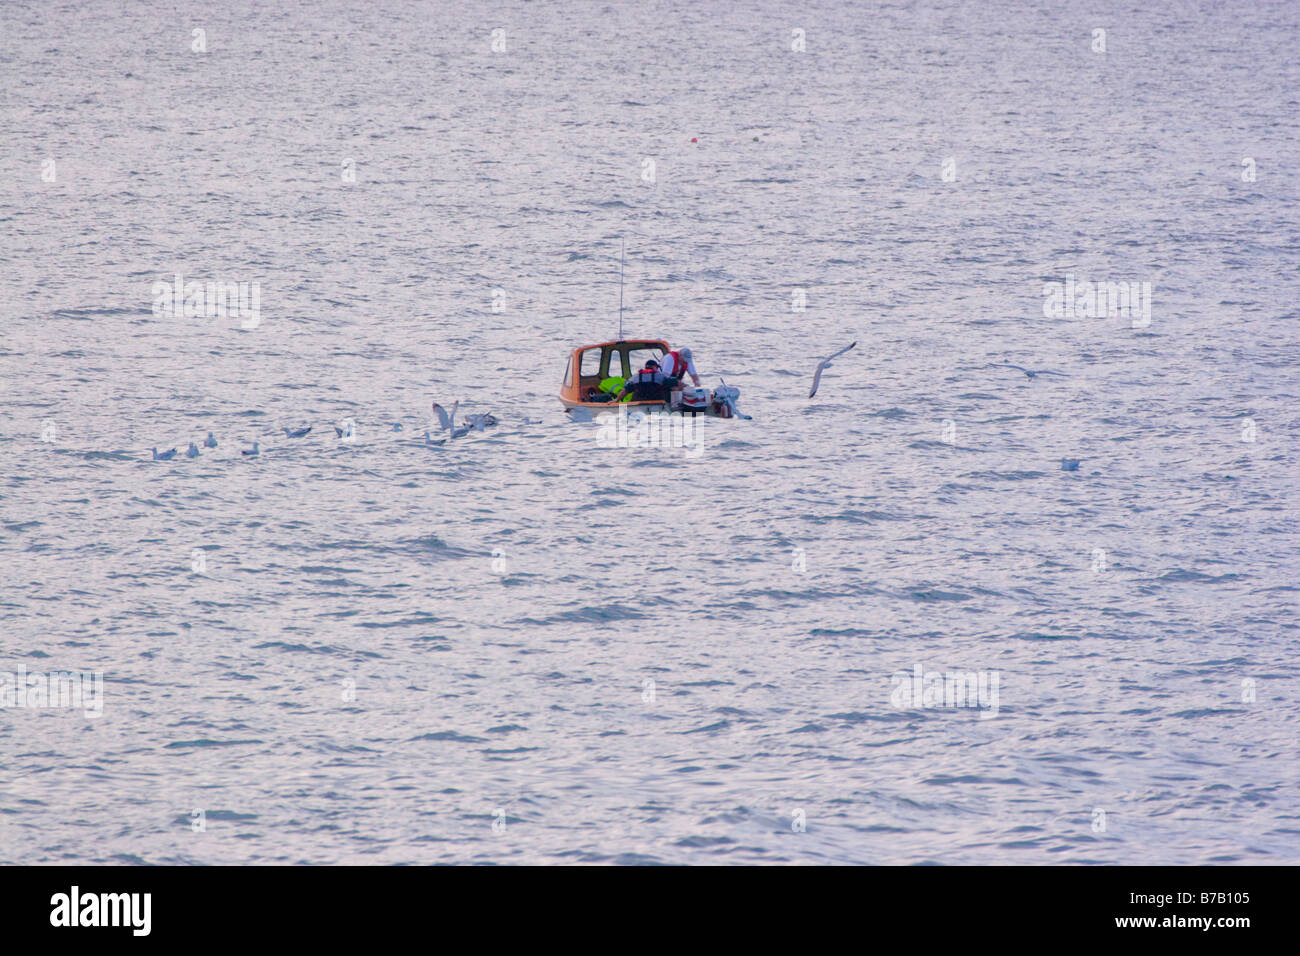 Llangrannog Beach Cardiganshire Cardigan bay Wales UK Fishing boat - Stock Image